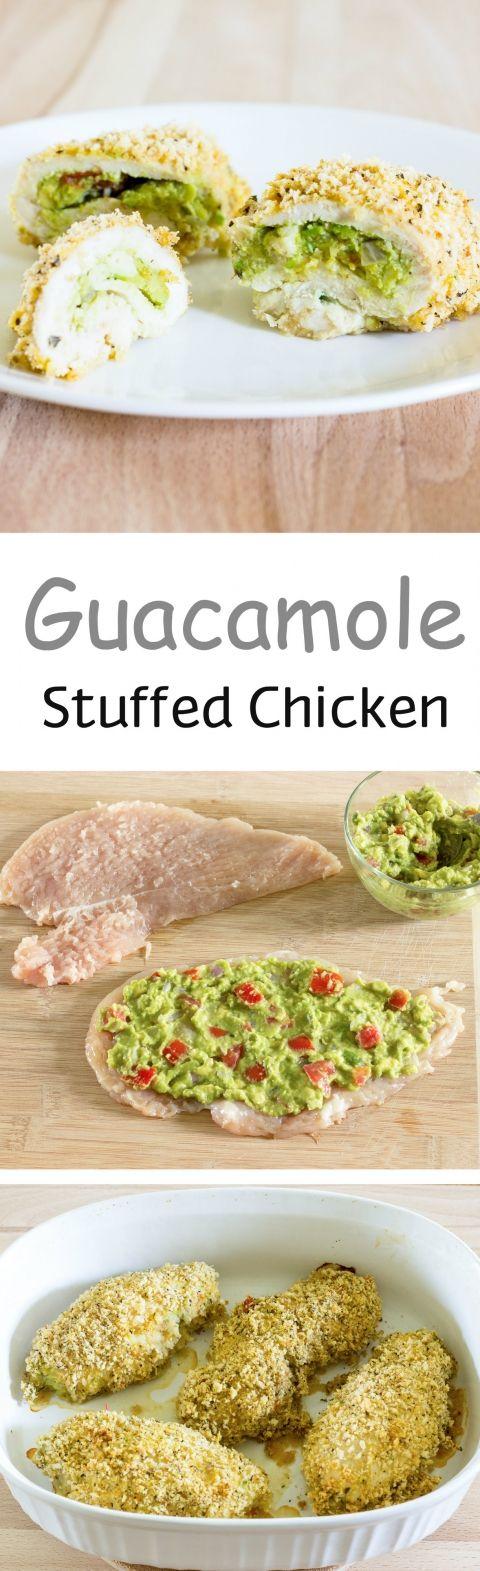 Guacamole Stuffed Chicken Breast- almond flour...